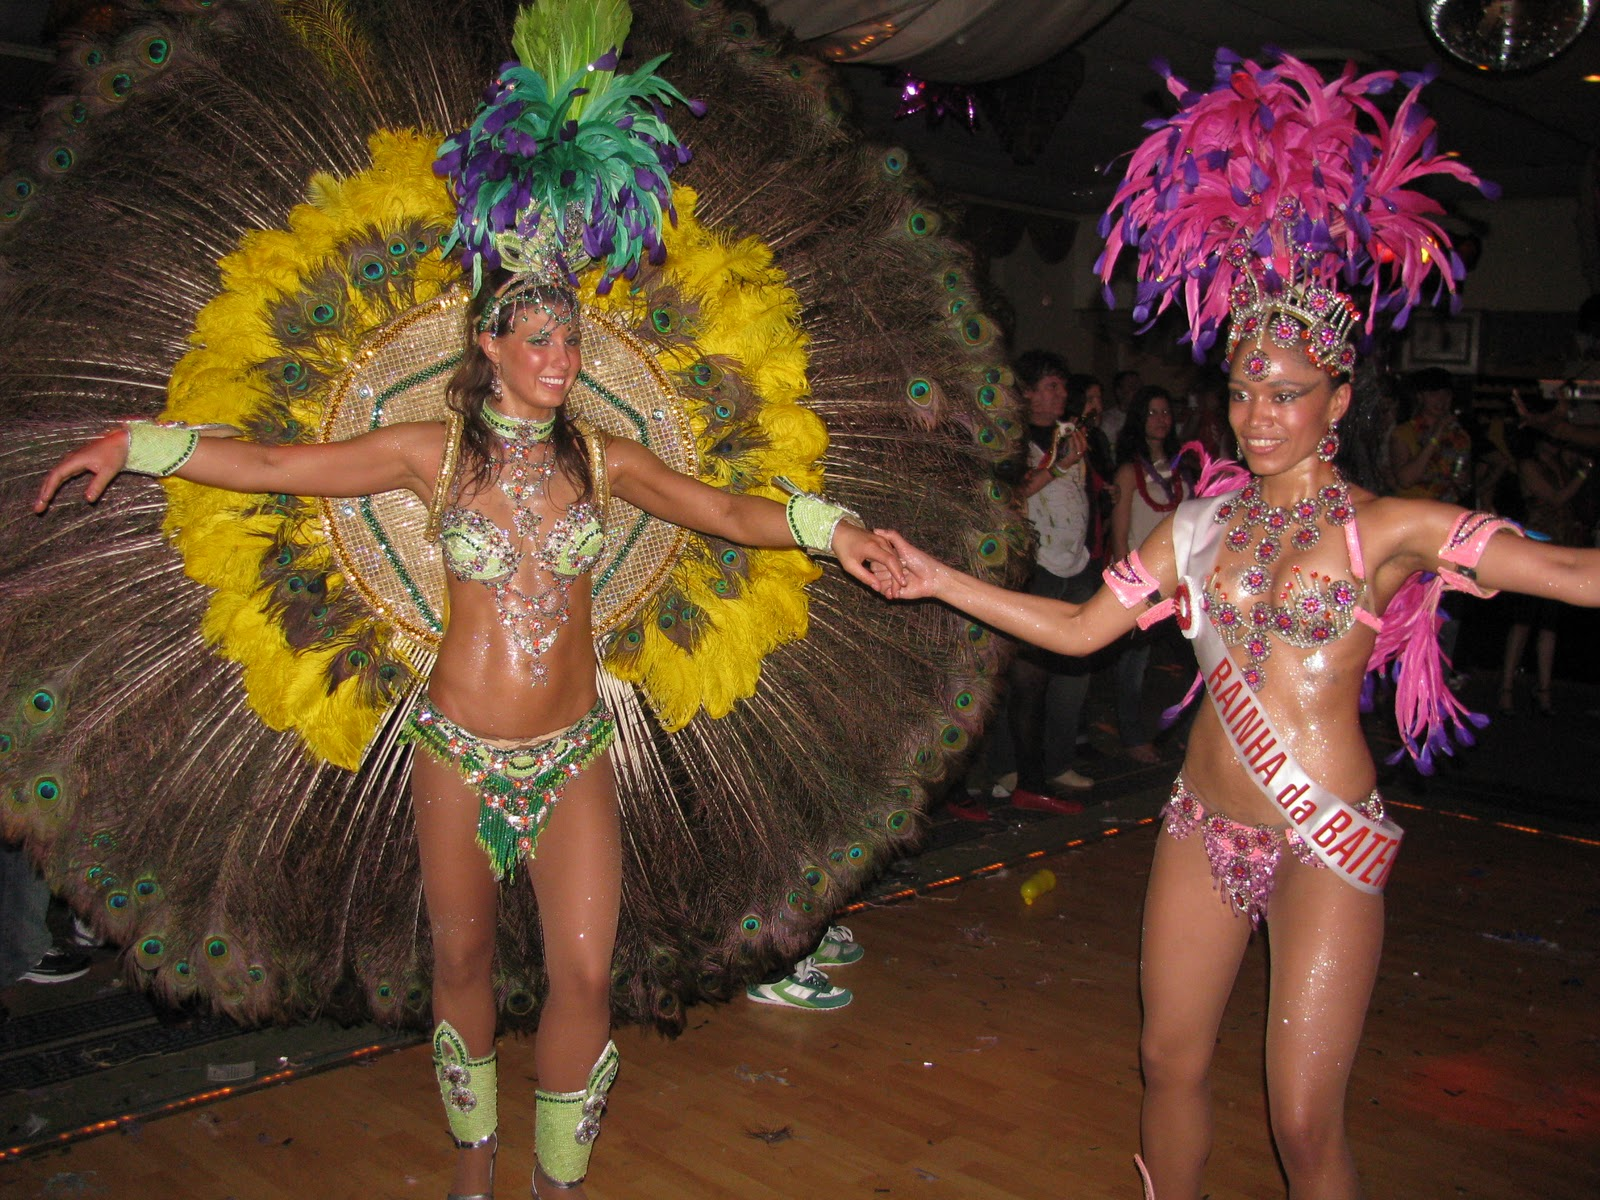 https://lh4.googleusercontent.com/-u_2RkvF_5U8/TXXTC5_HmDI/AAAAAAAAAFY/9lw9Z6F0l3s/s1600/carnaval-brasil-ace-place-1.jpg